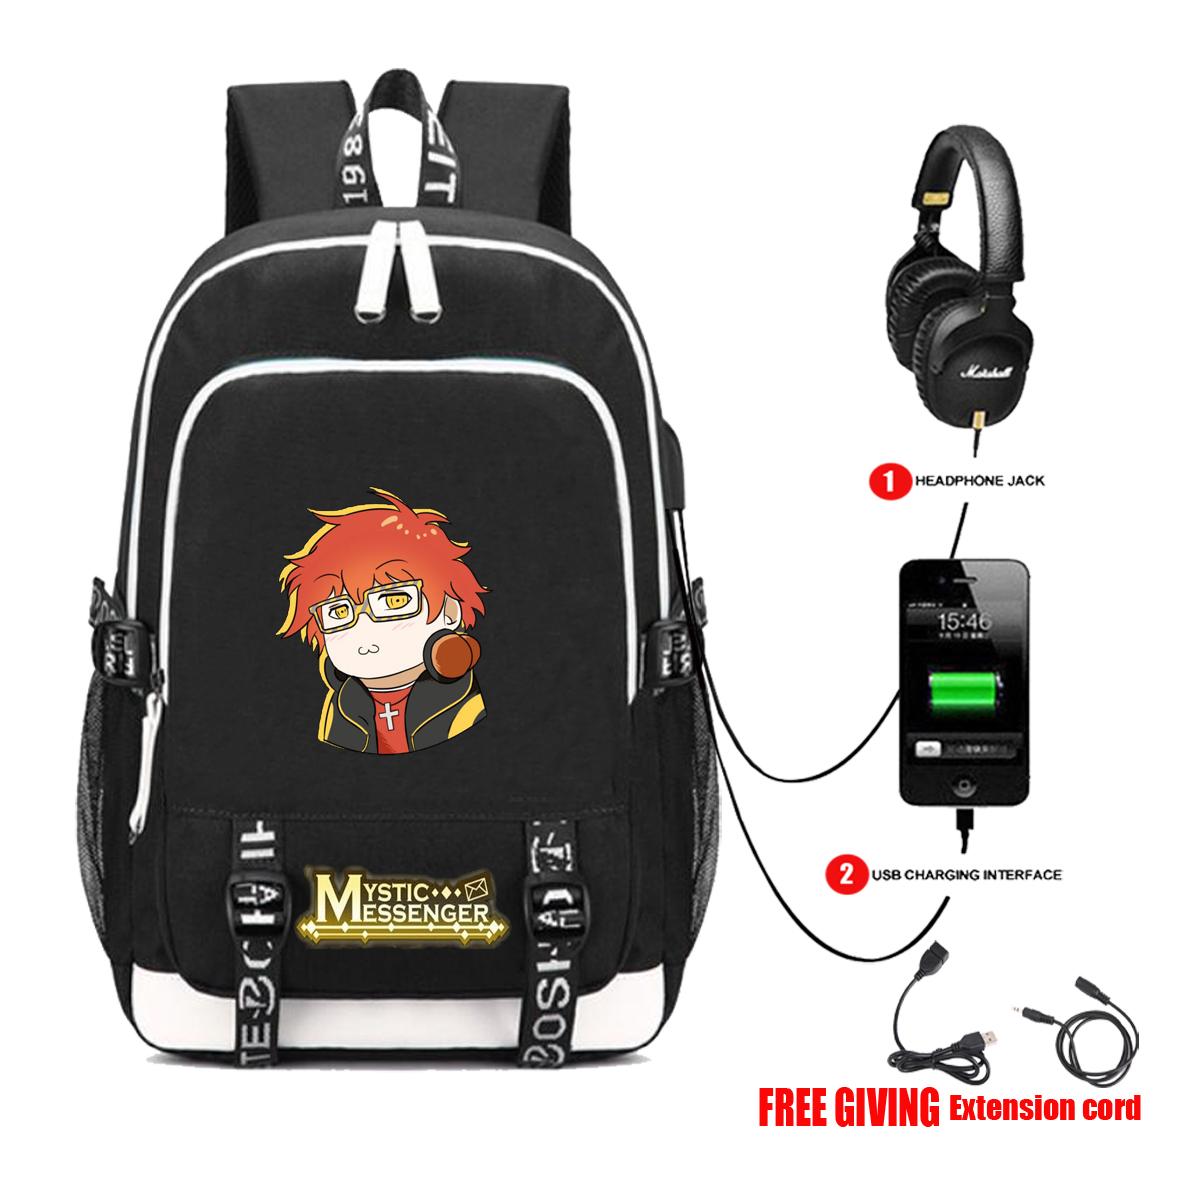 Cartoon mysterious messenger Backpack Travel Backpack student schoolbag USB headset interface multifunctional computer bag